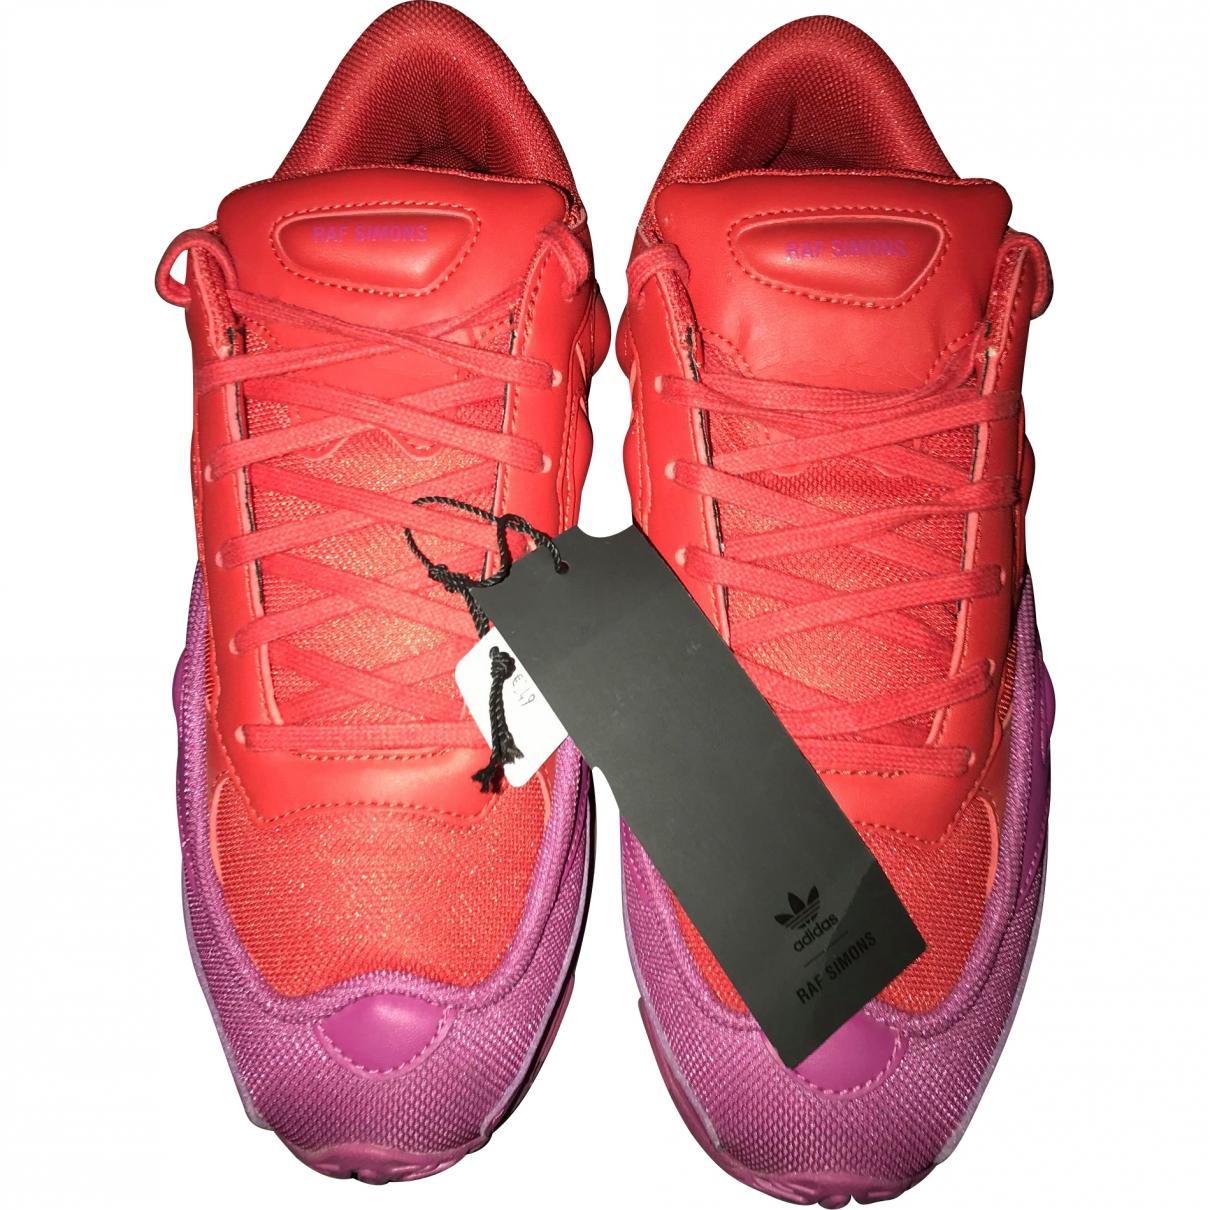 Adidas X Raf Simons Ozweego 2 Purple Leather Trainers for Men 9 US